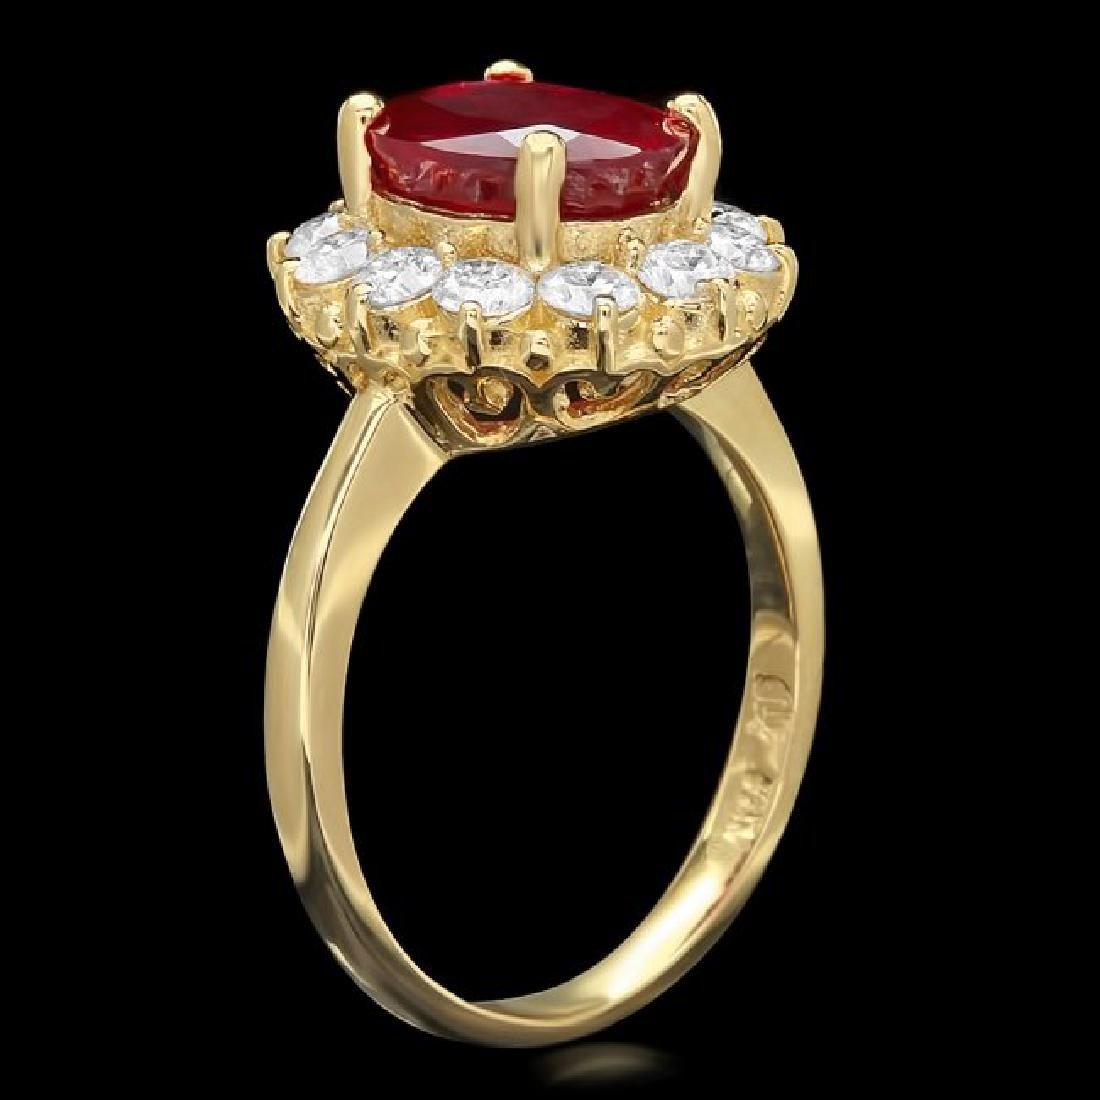 14k Yellow Gold 3.61ct Ruby 1.05ct Diamond Ring - 2